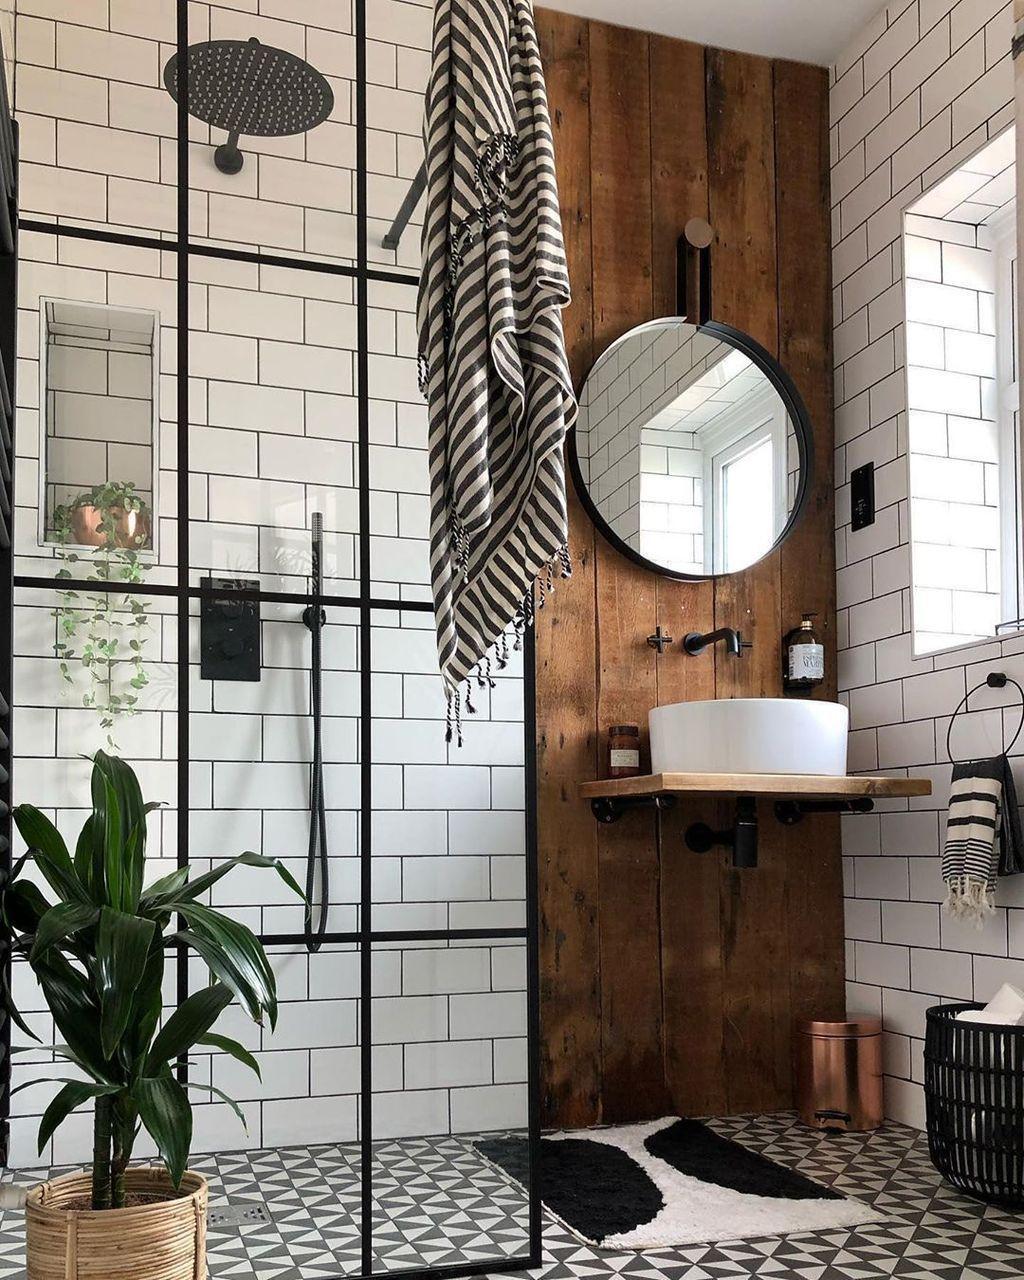 32 Atemberaubende Industrielle Badezimmer Design Ideen Badezimmer Dekor Ideen Badezimmer Design In 2020 Industrial Bathroom Design Floor Design House Interior